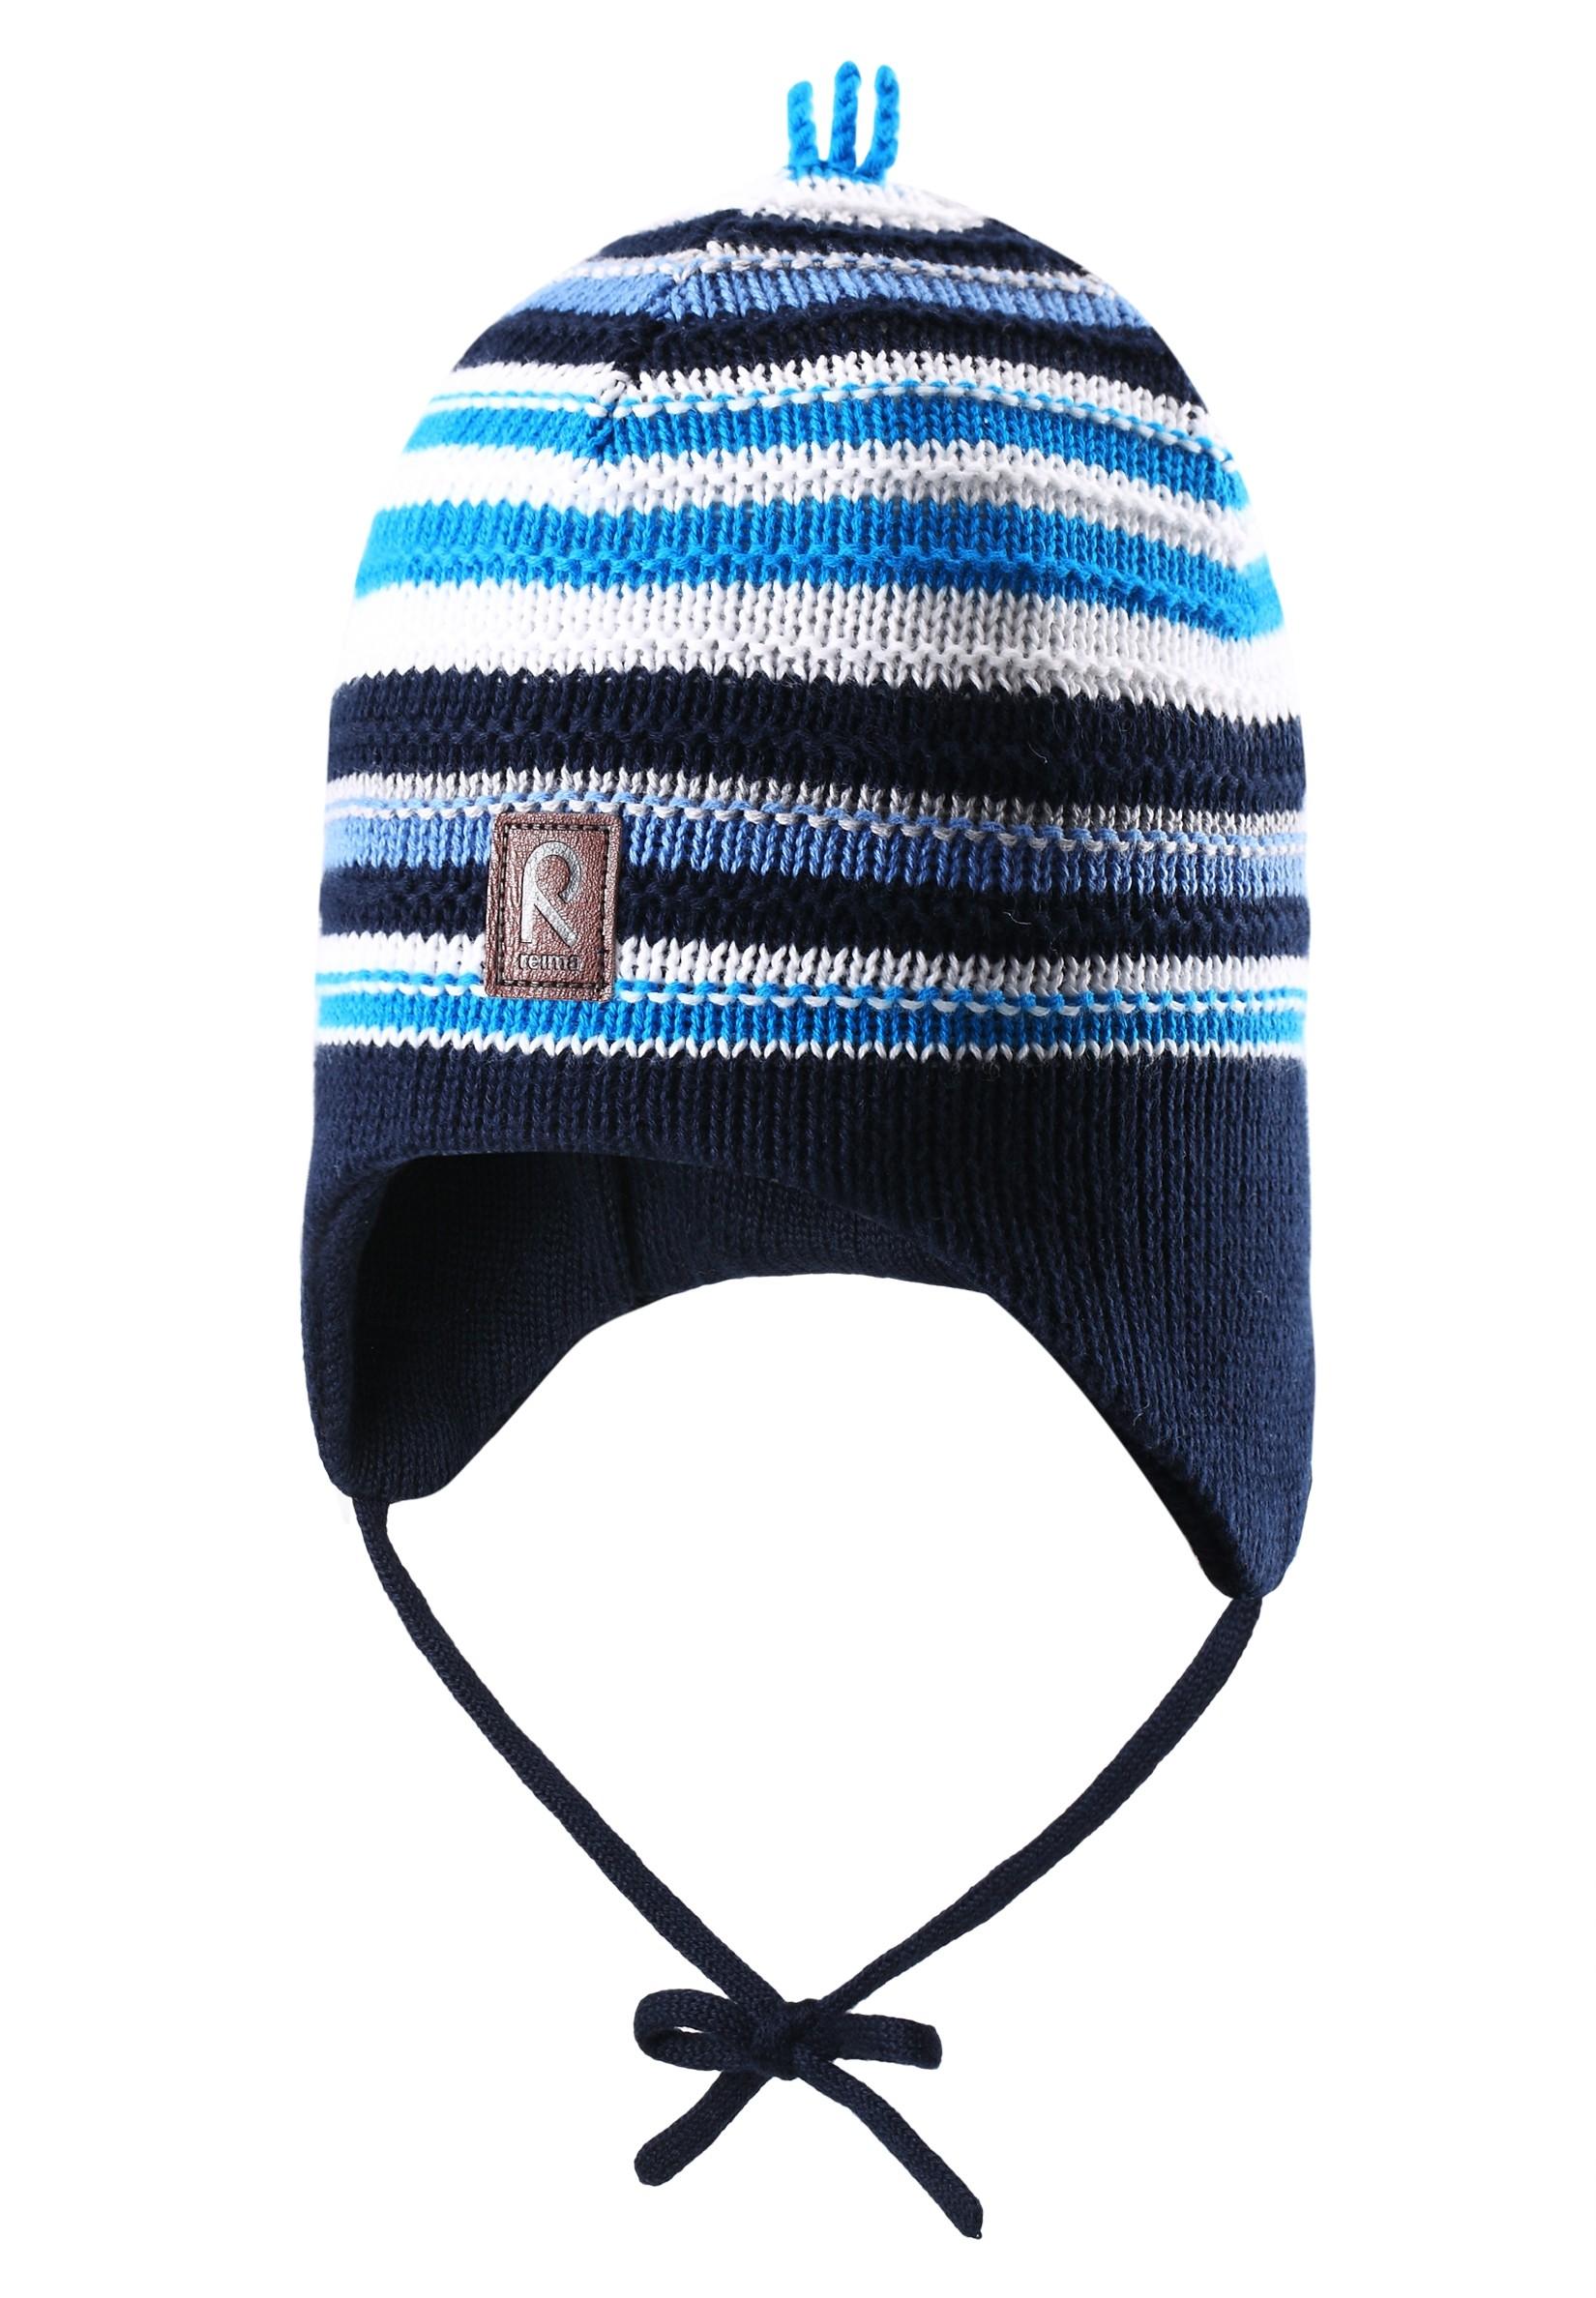 Головные уборы Reima Шапка для мальчика Beanie, Beetroot navy, синяя chaos шапка reverse 026 navy